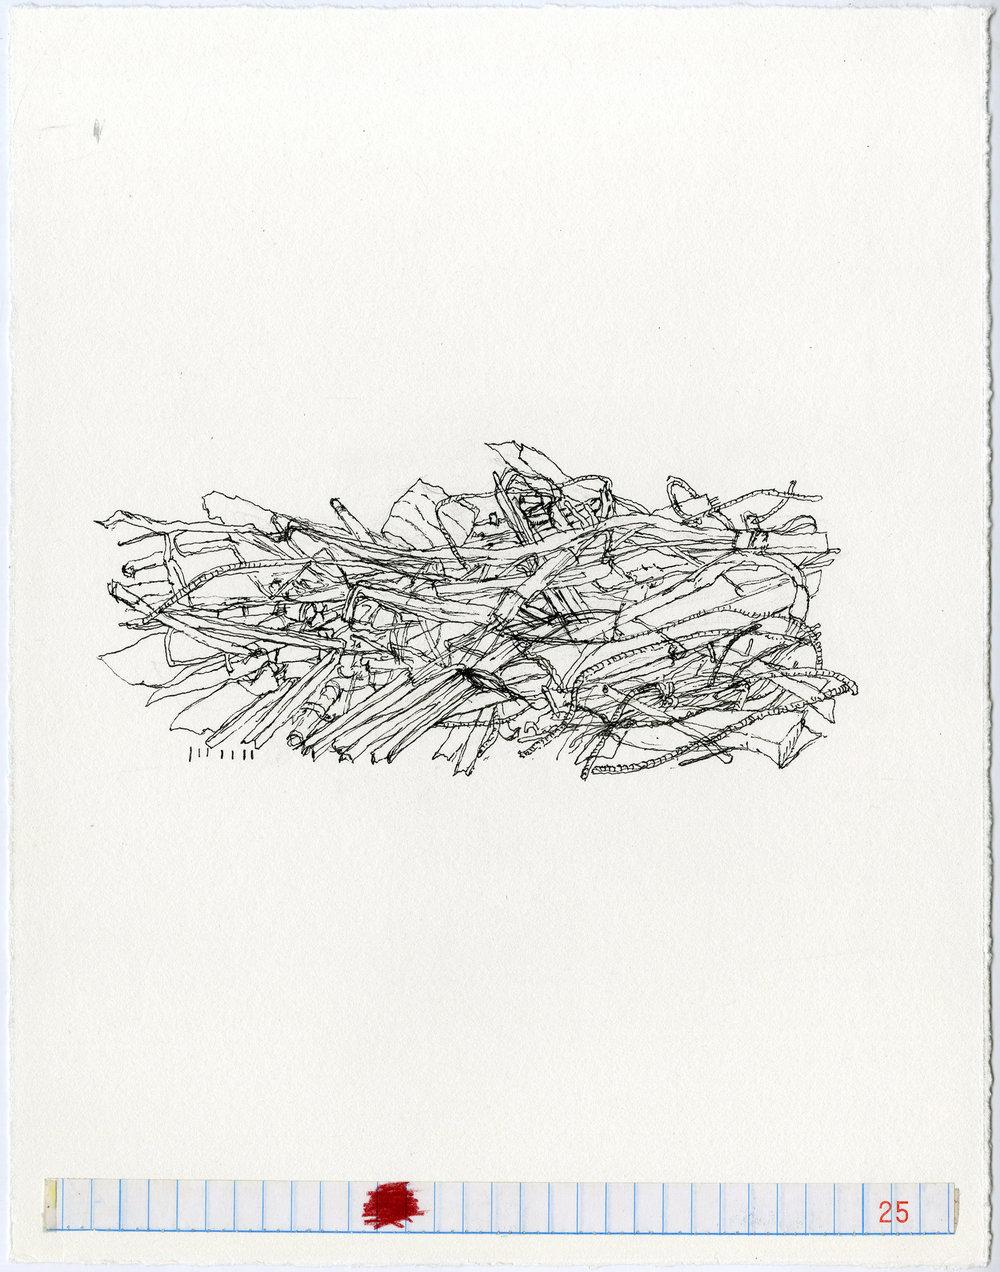 organized pile